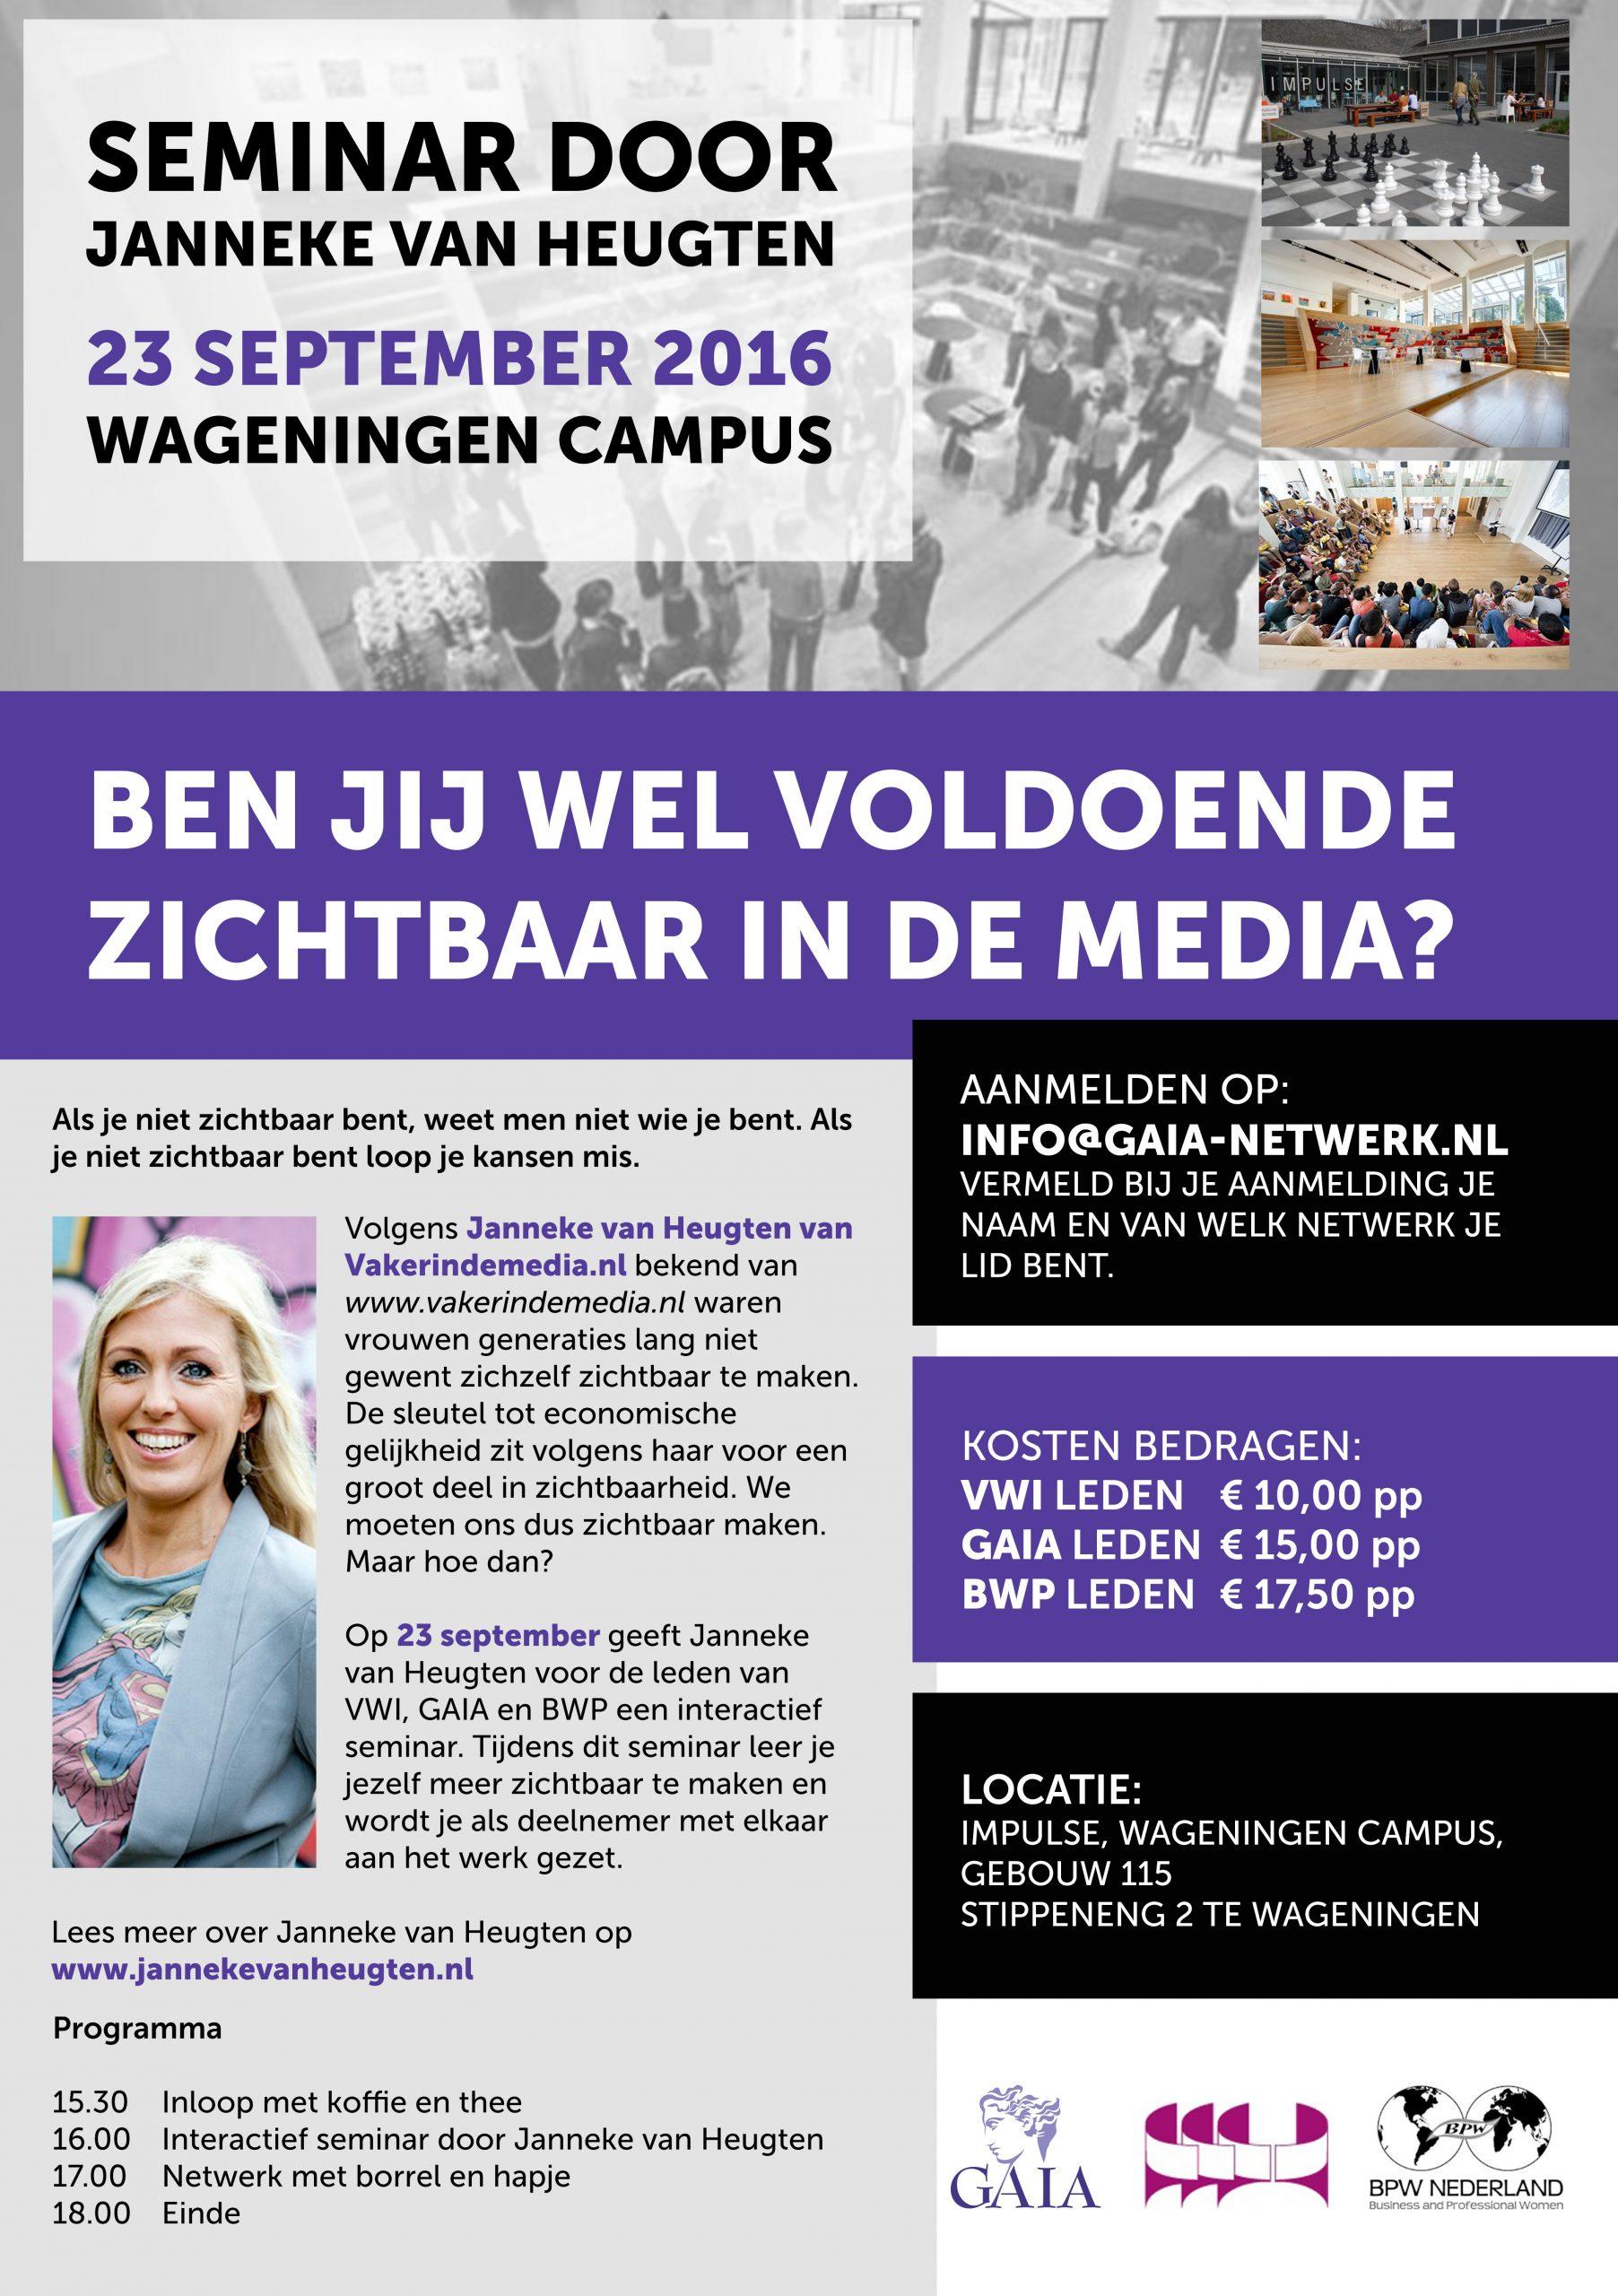 Gaia-Netwerkevent-seminar-(Wageningen)-v5.1